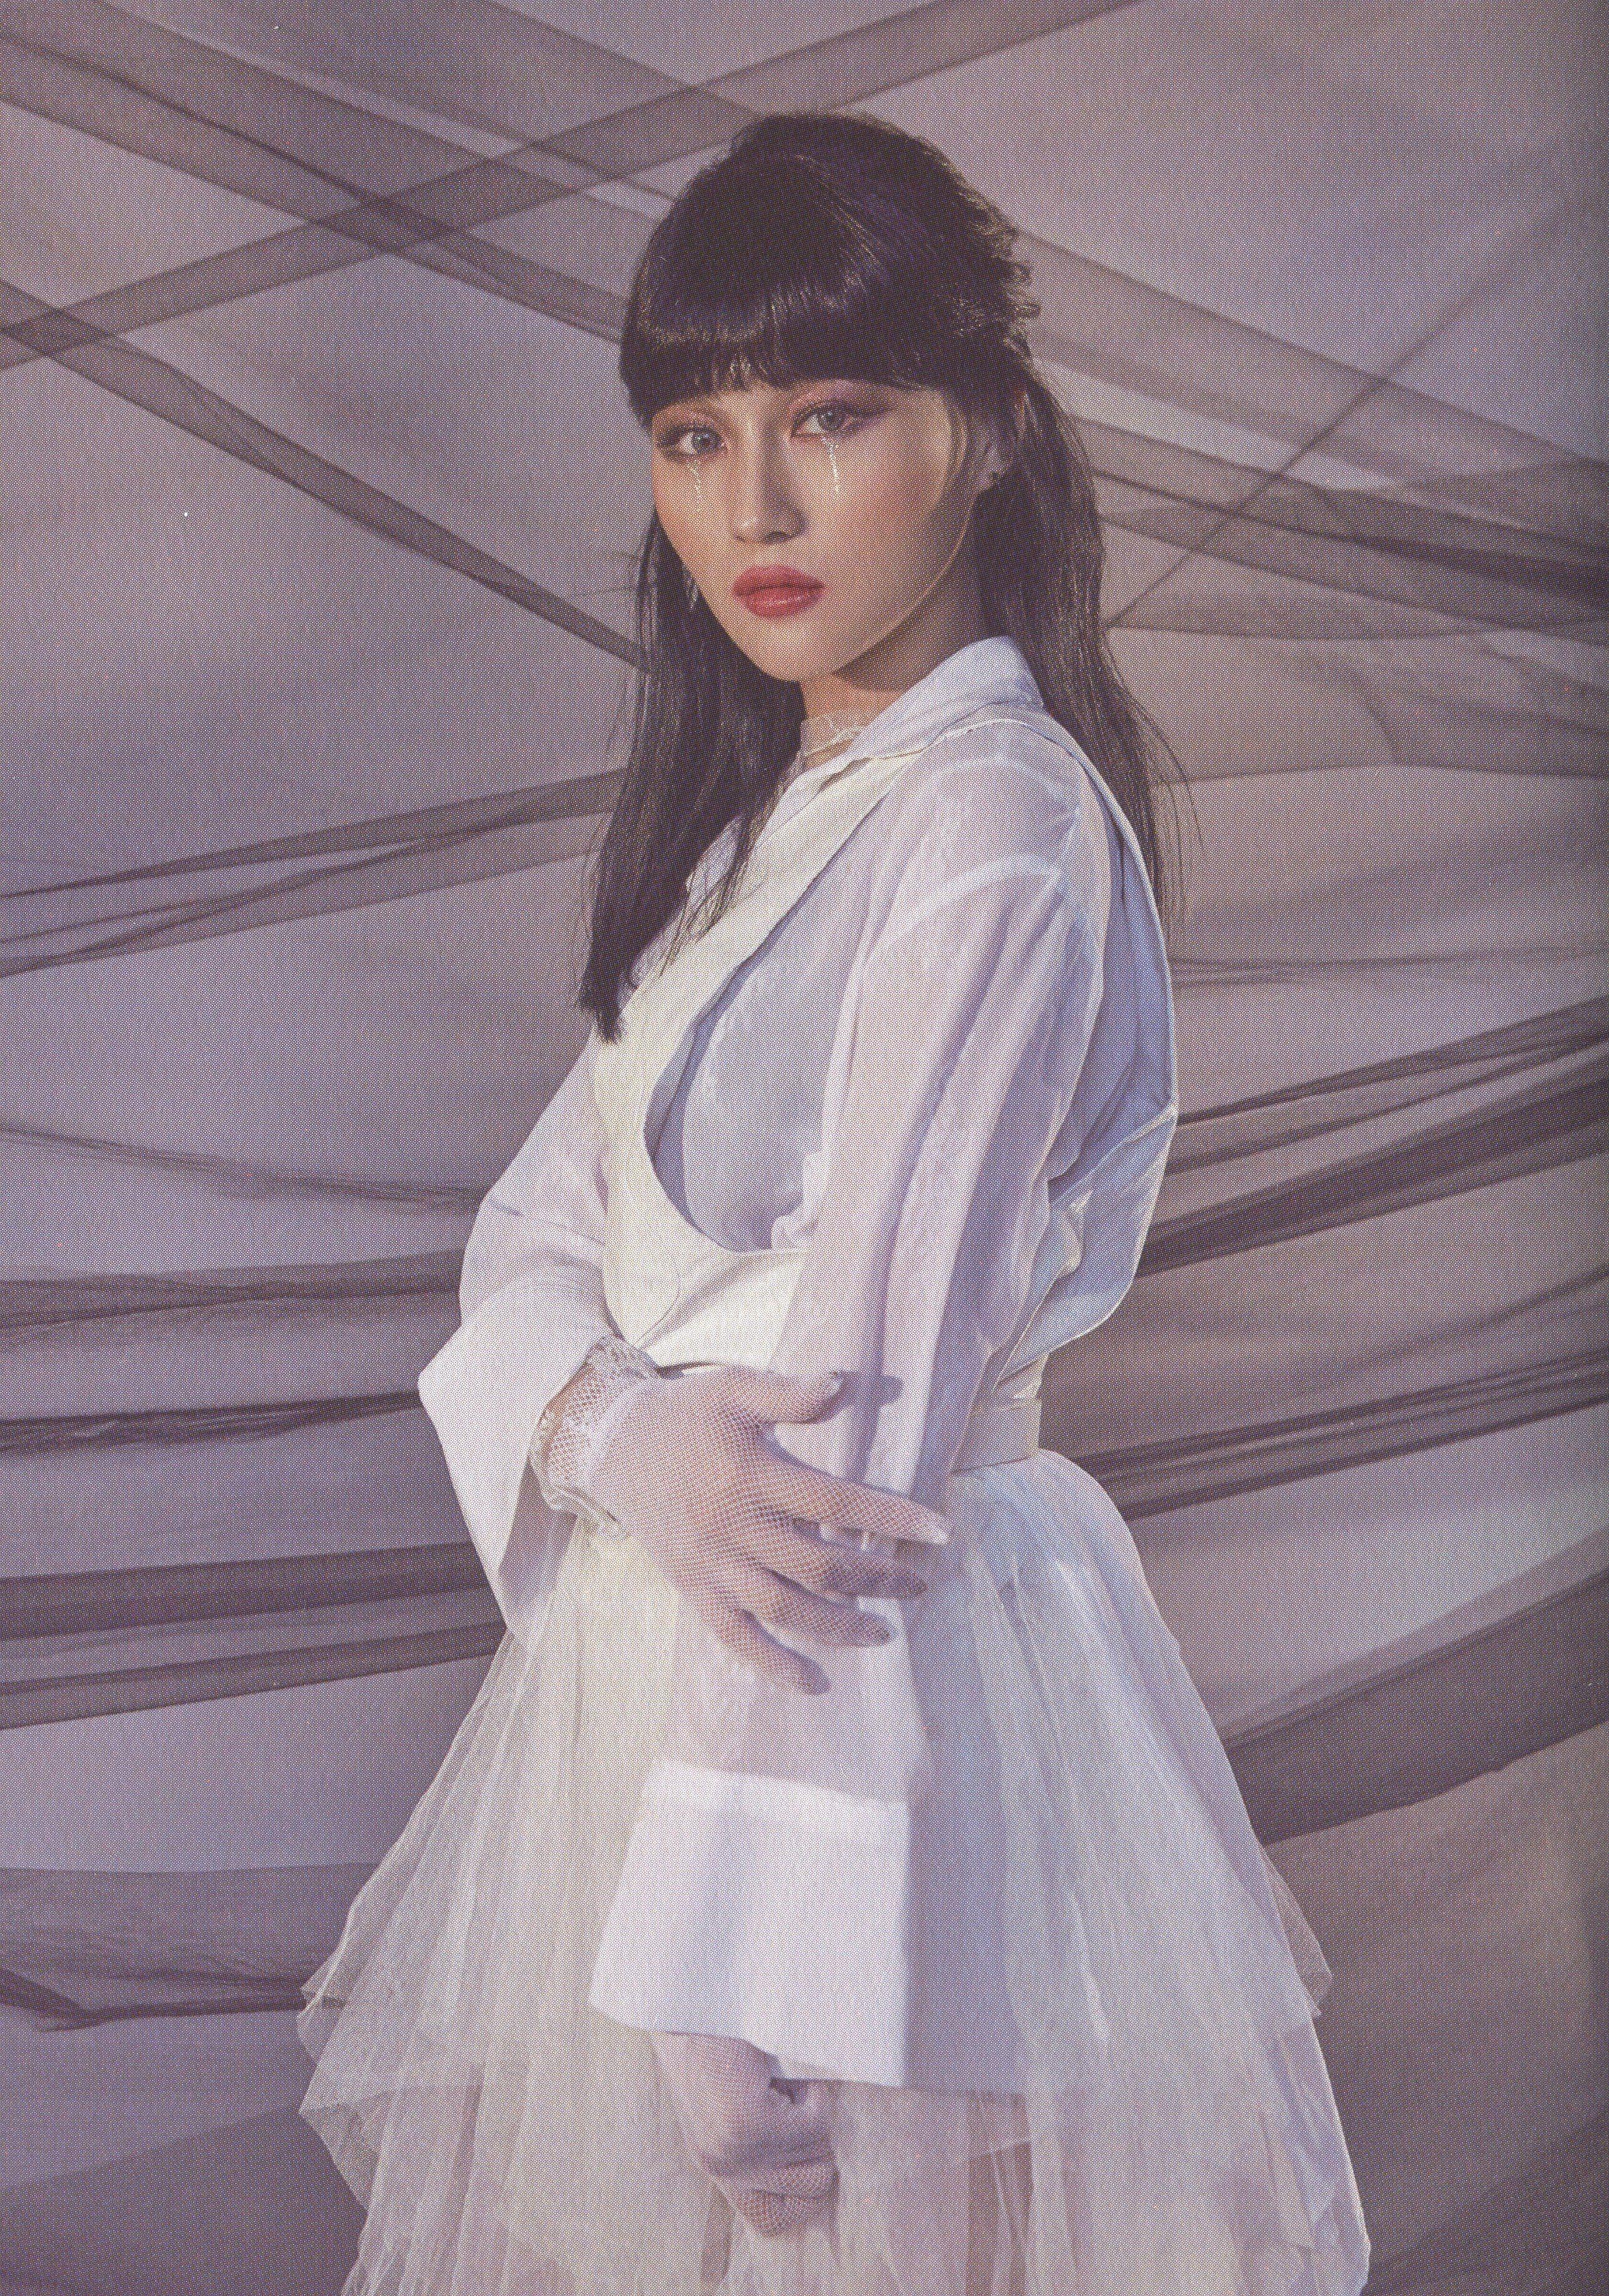 Pin By ʀɪɴᴀ On Dreamcatcher Dream Catcher Kpop Girl Groups Eccentric Style